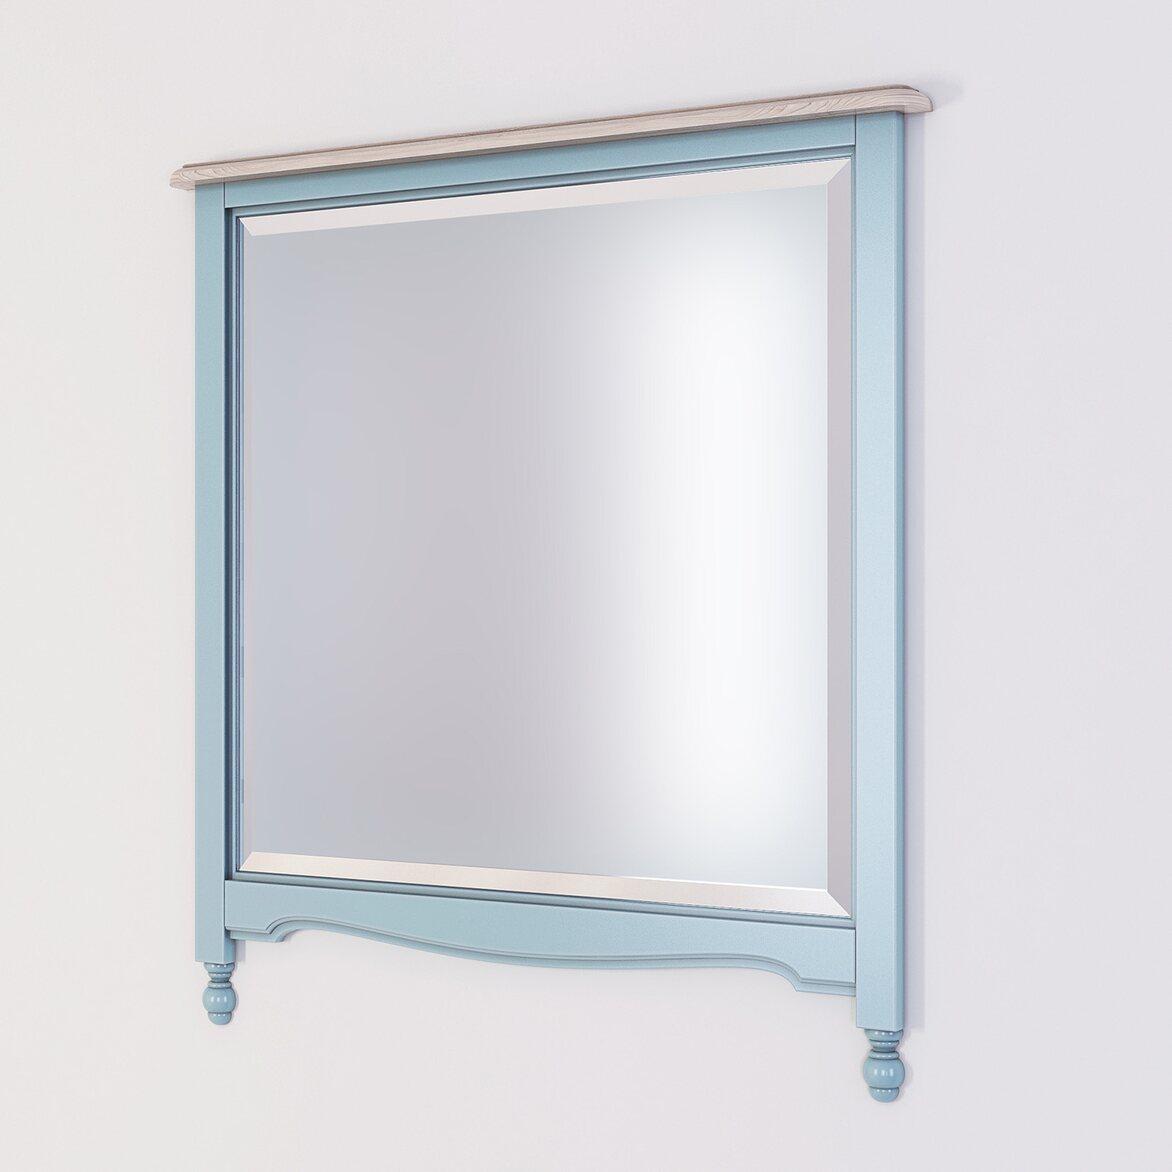 Зеркало прямоугольное Leblanc, голубое | Настенные зеркала Kingsby